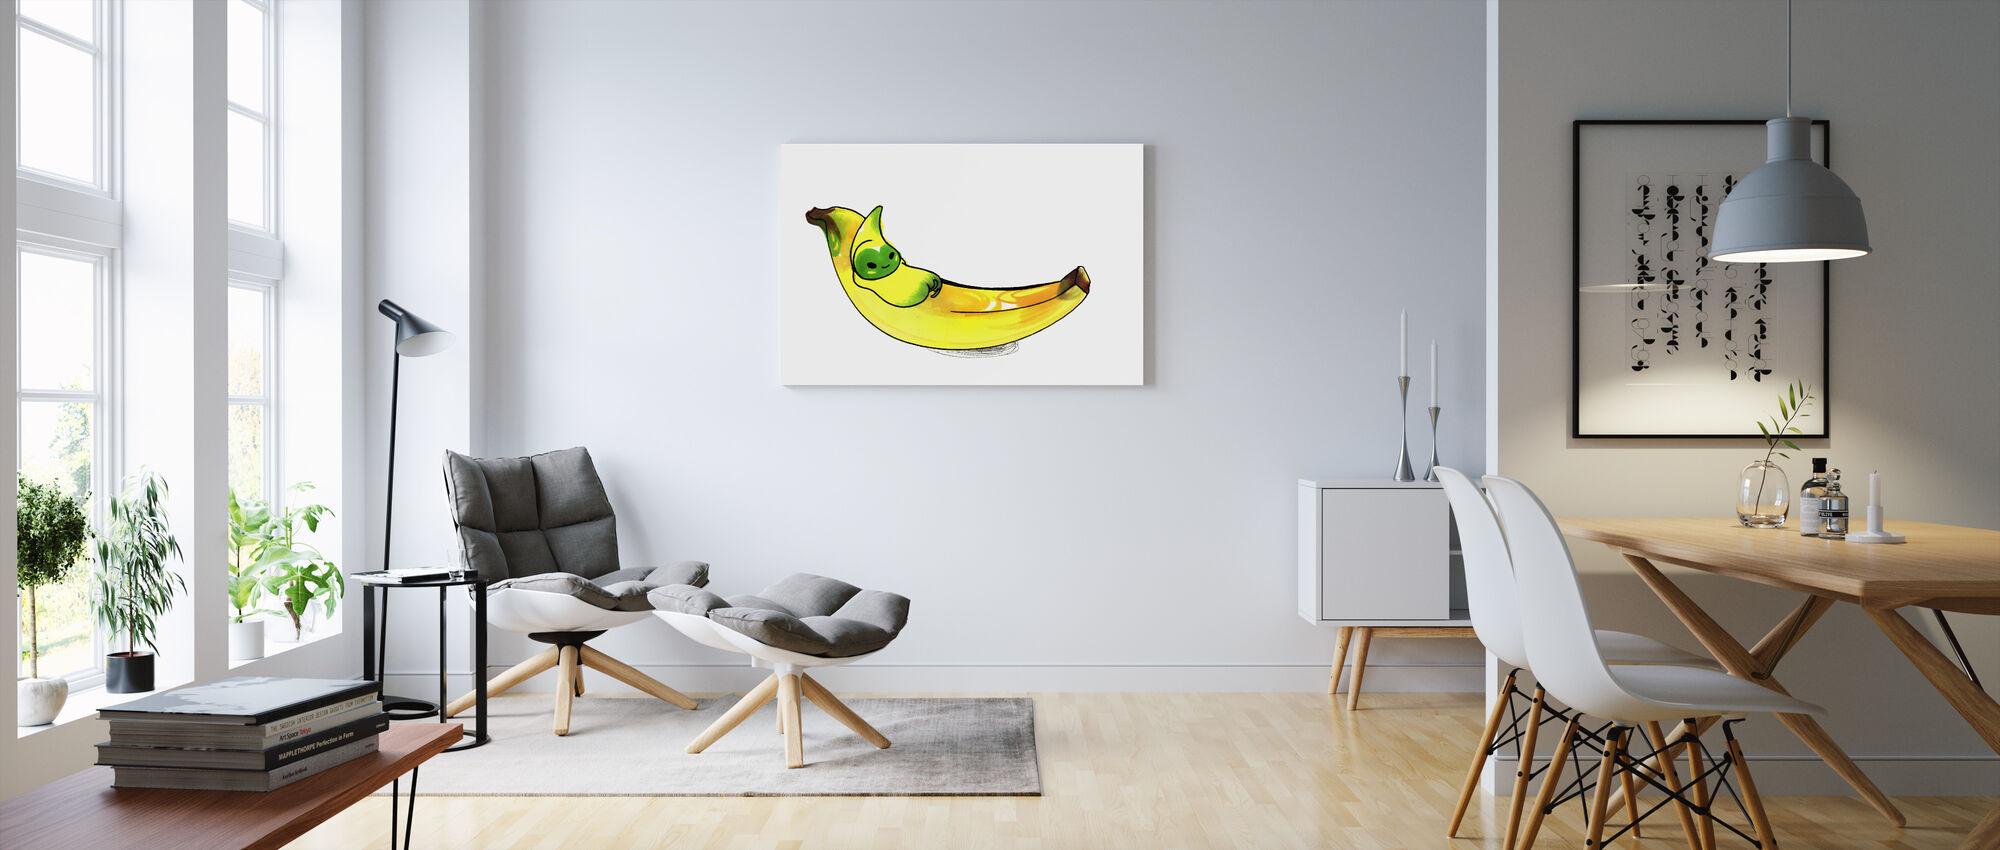 Banane - Impression sur toile - Salle à manger